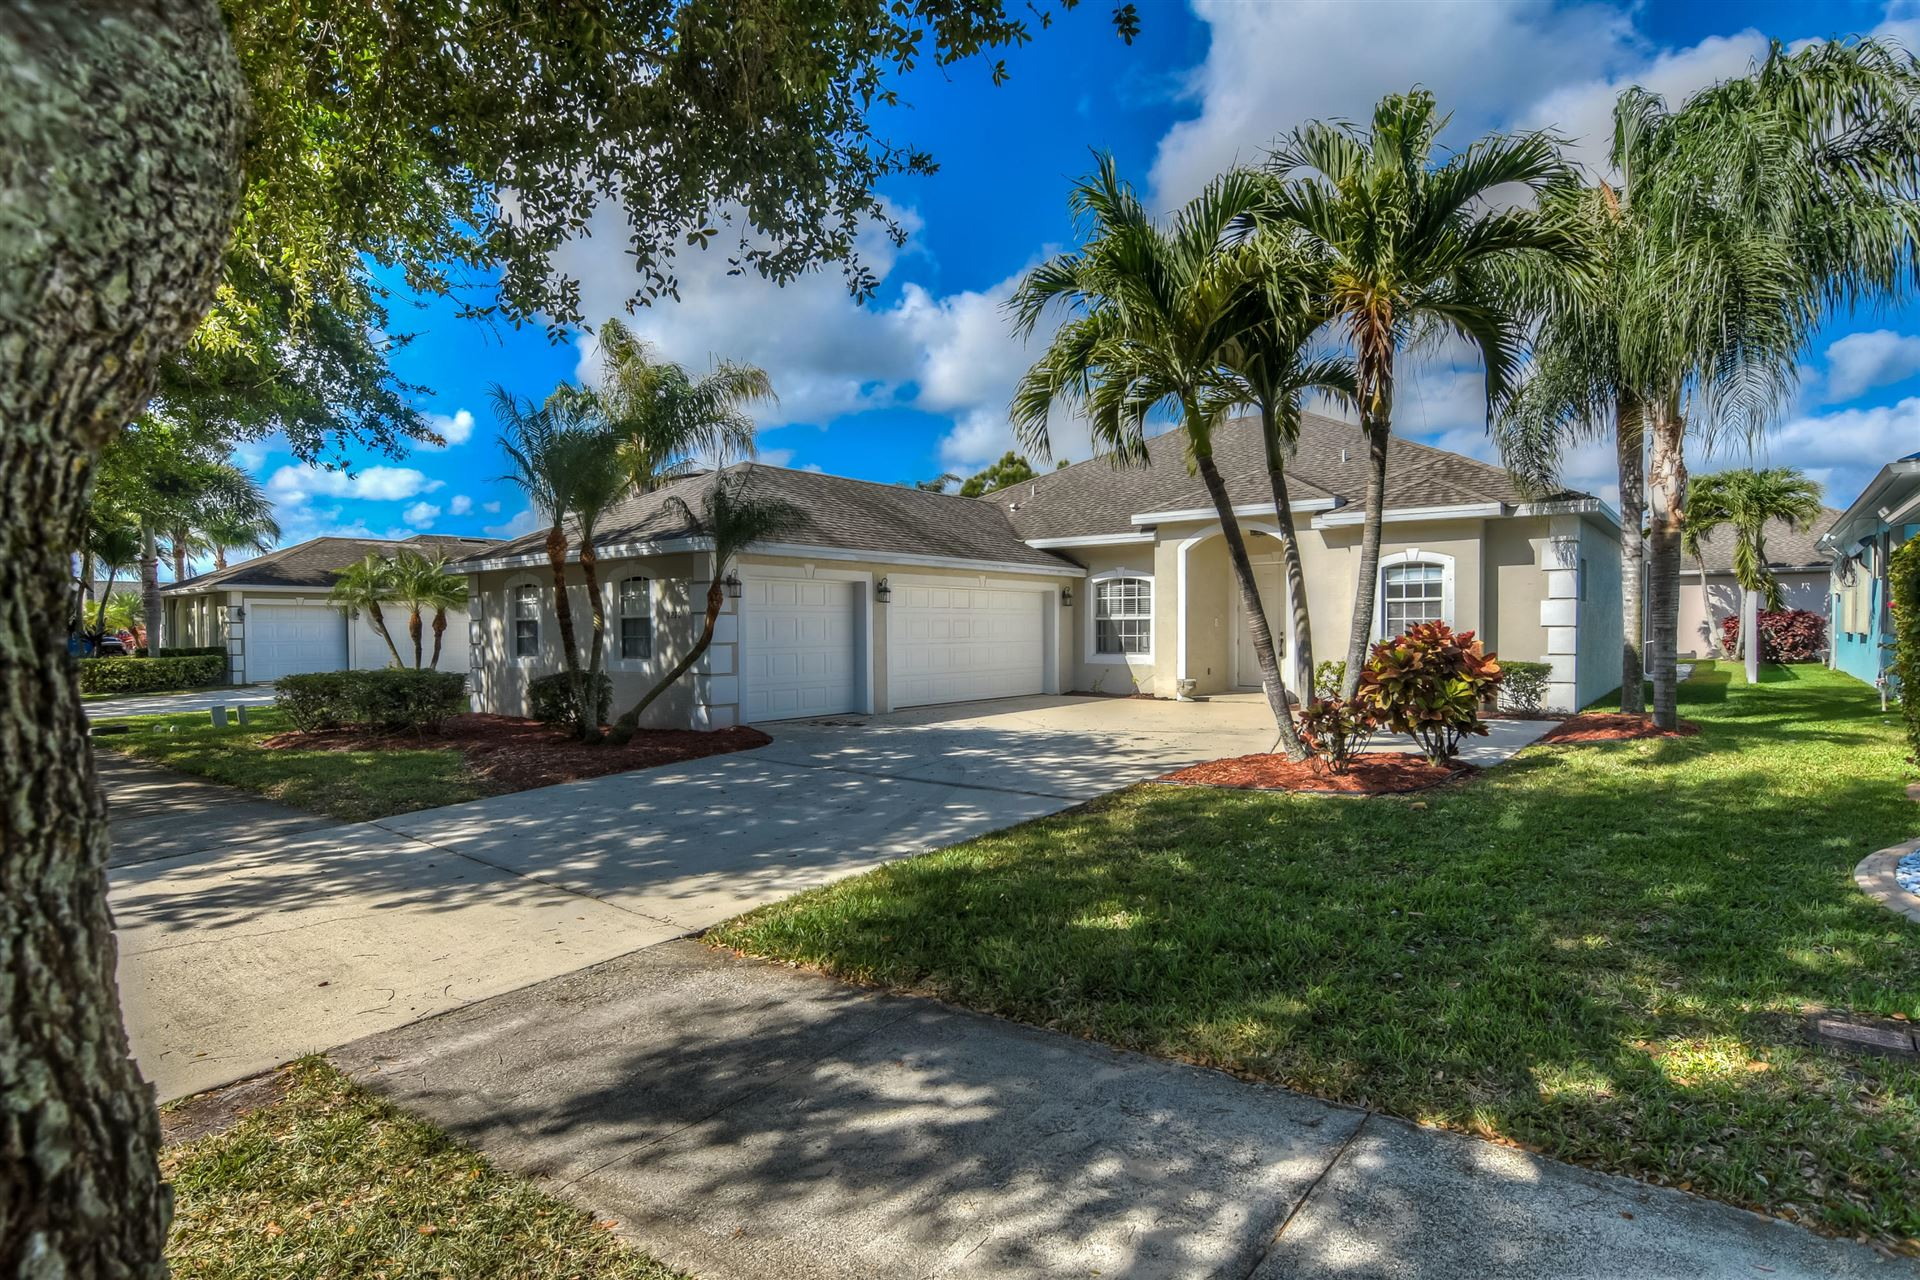 2270 NW Windemere Drive, Jensen Beach, FL 34957 - #: RX-10611504